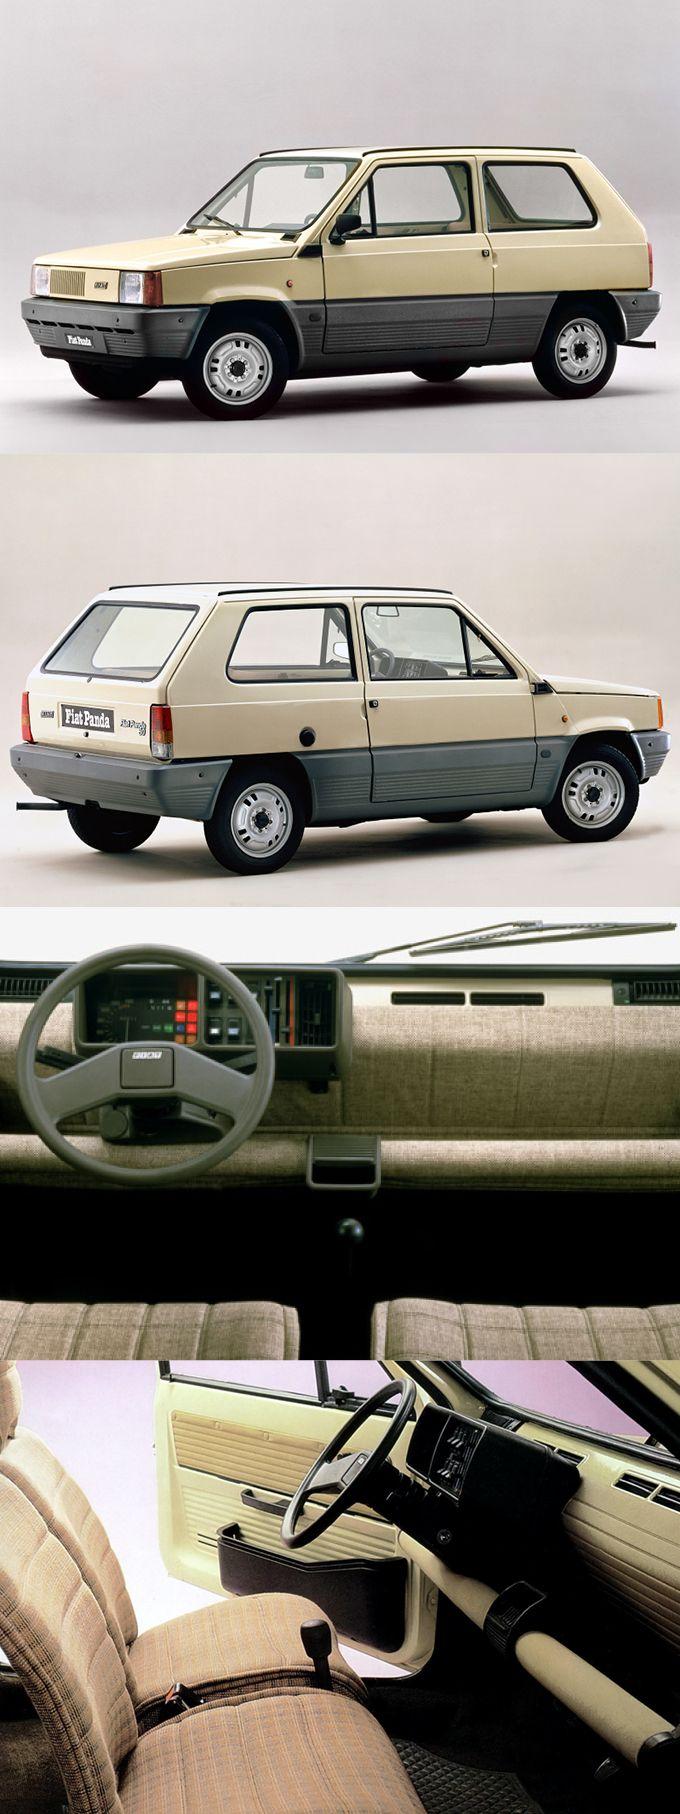 1980 Fiat Panda / 141 / Italy / beige / 17-170